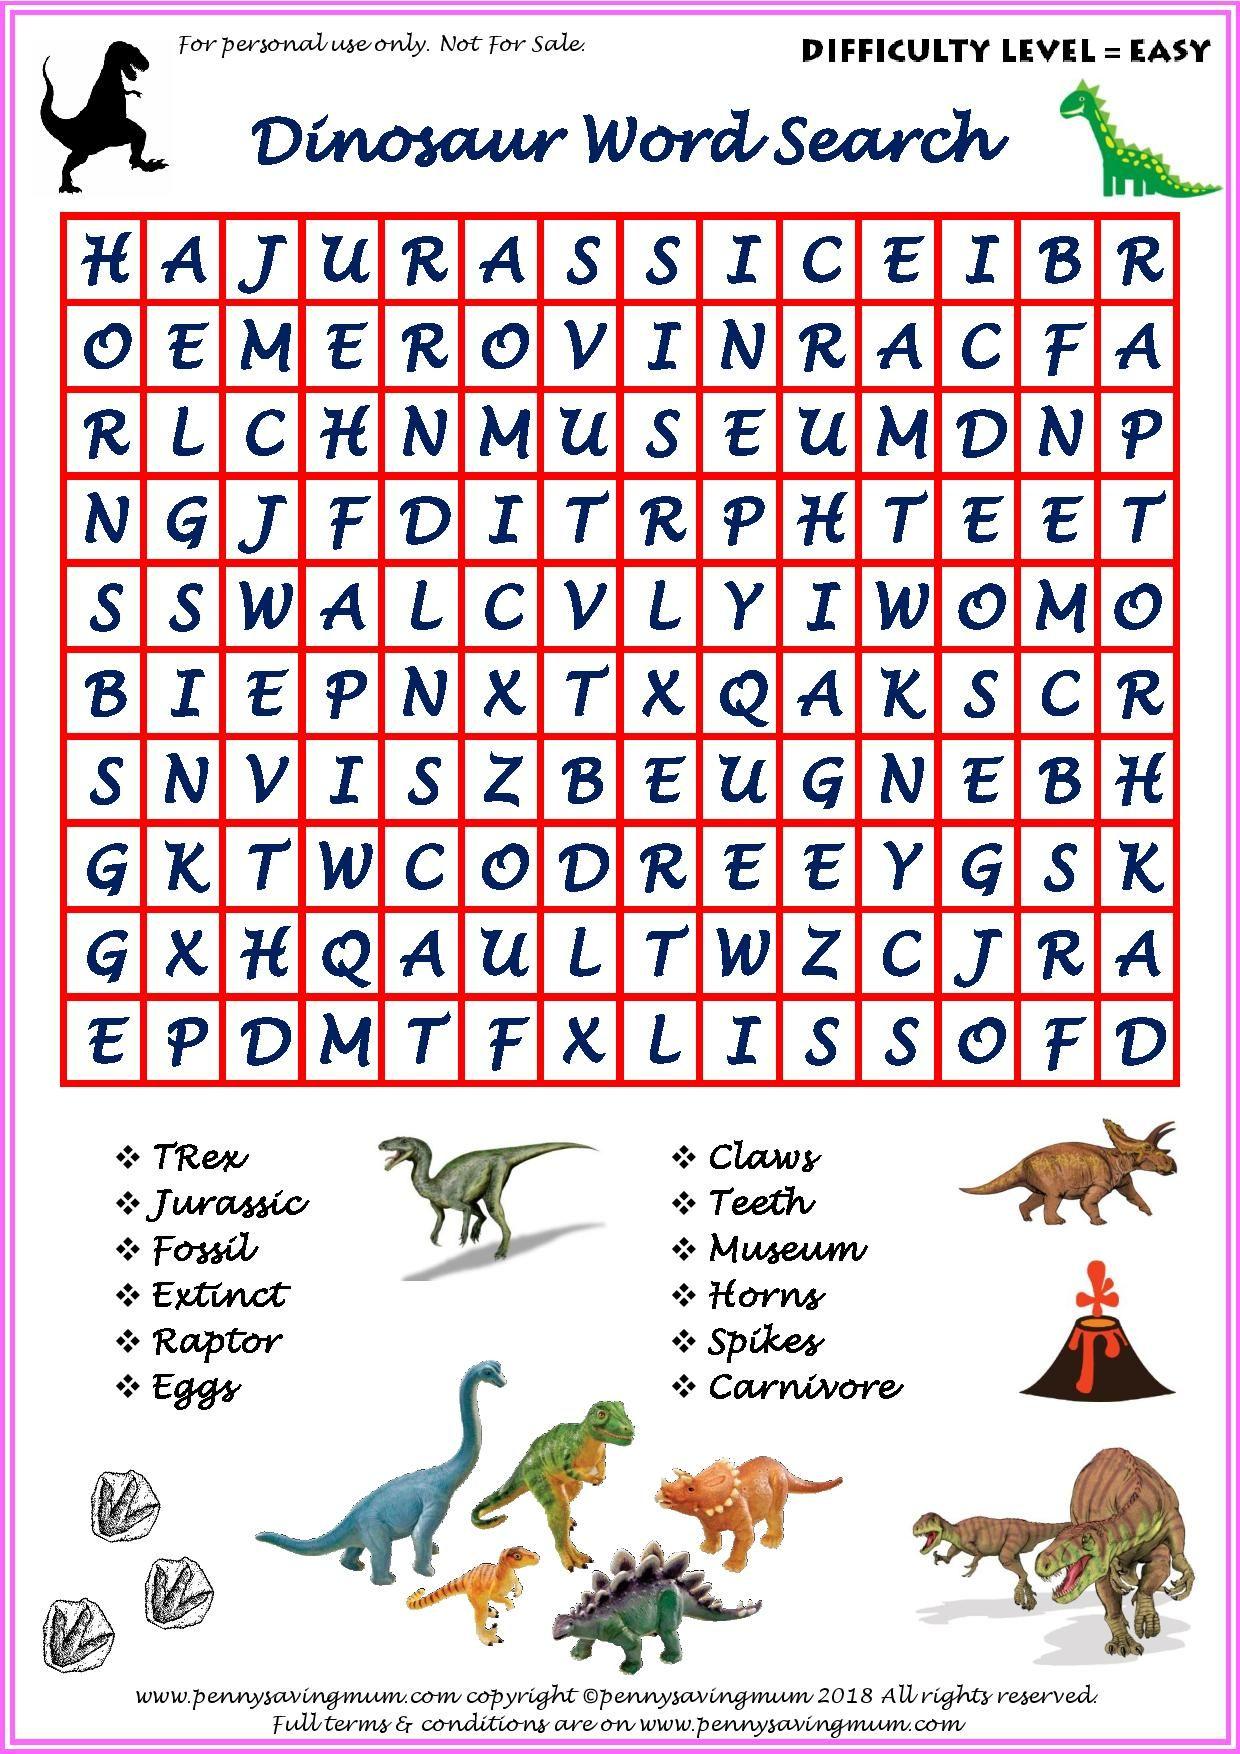 Word Search Dinosaur Easy Version